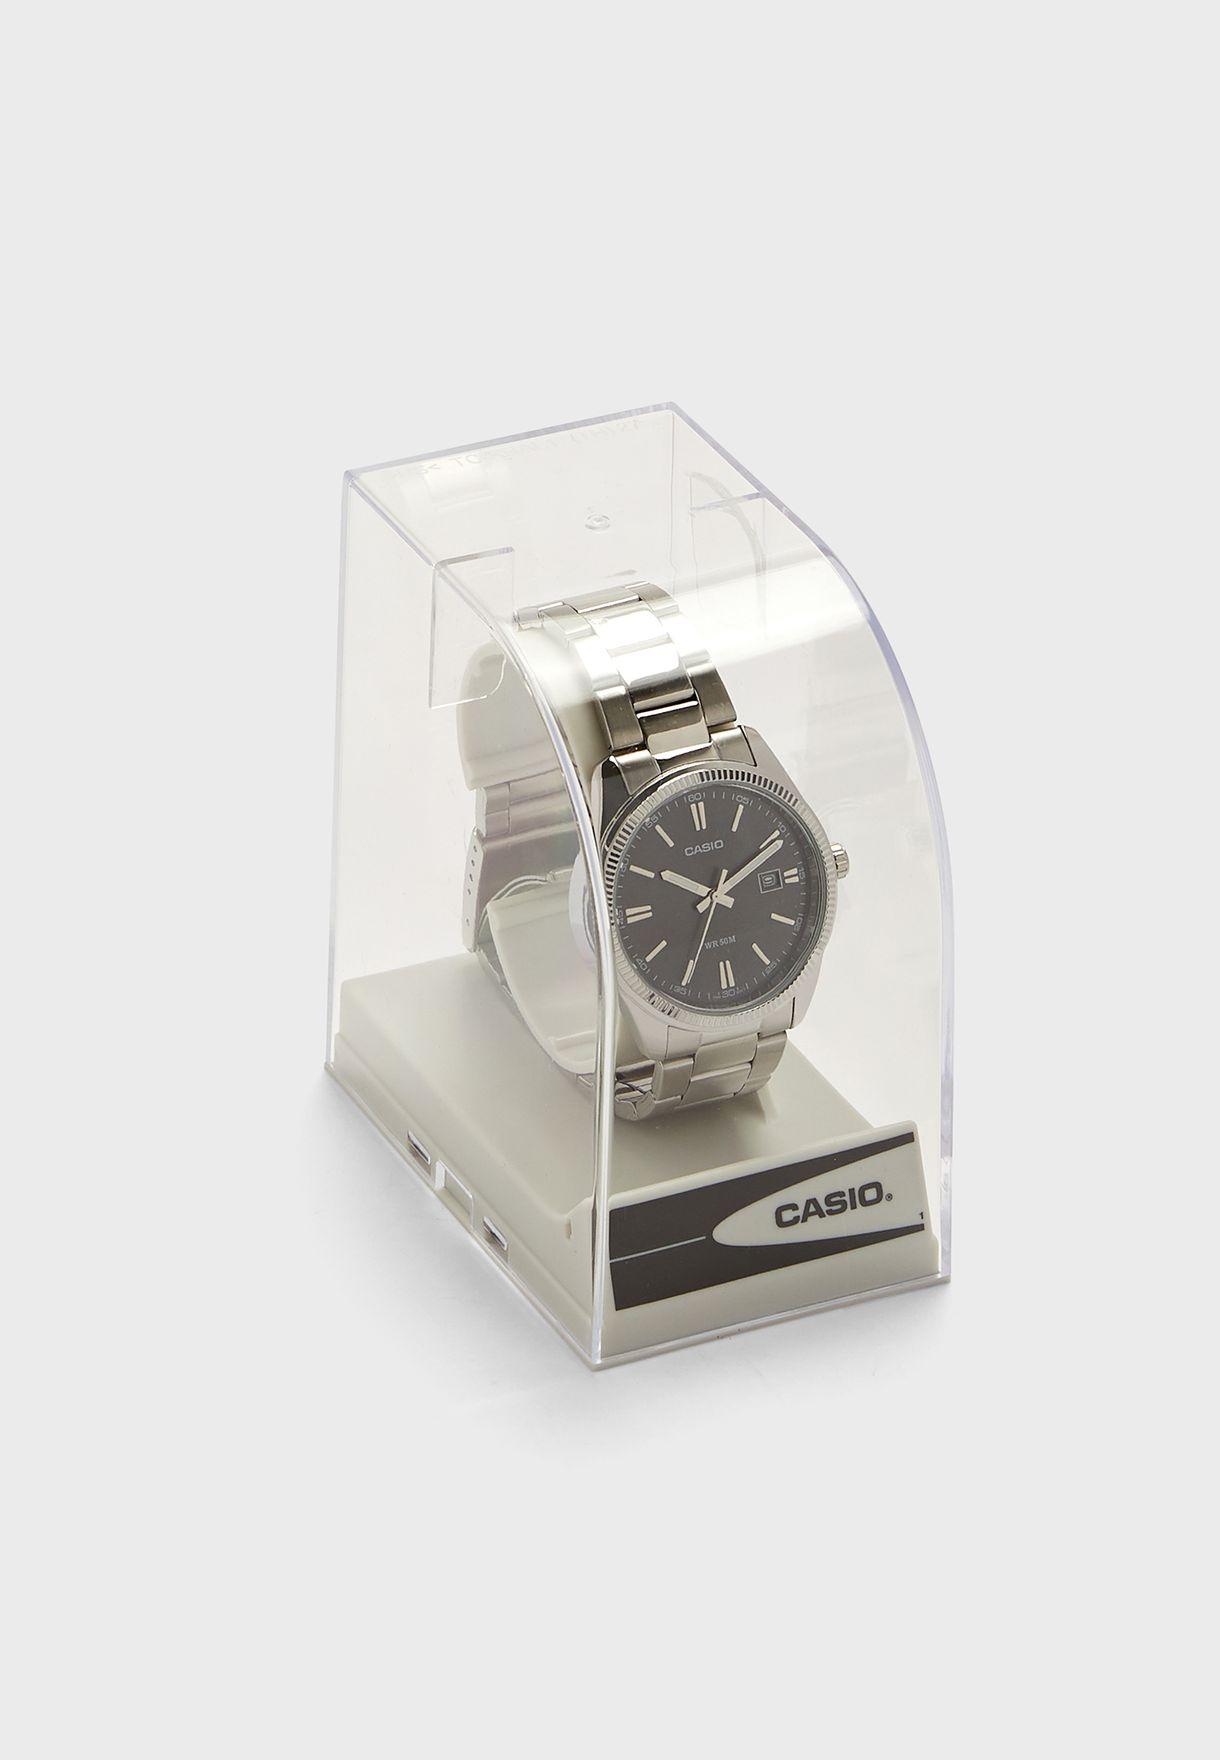 General Standard Analog Watch